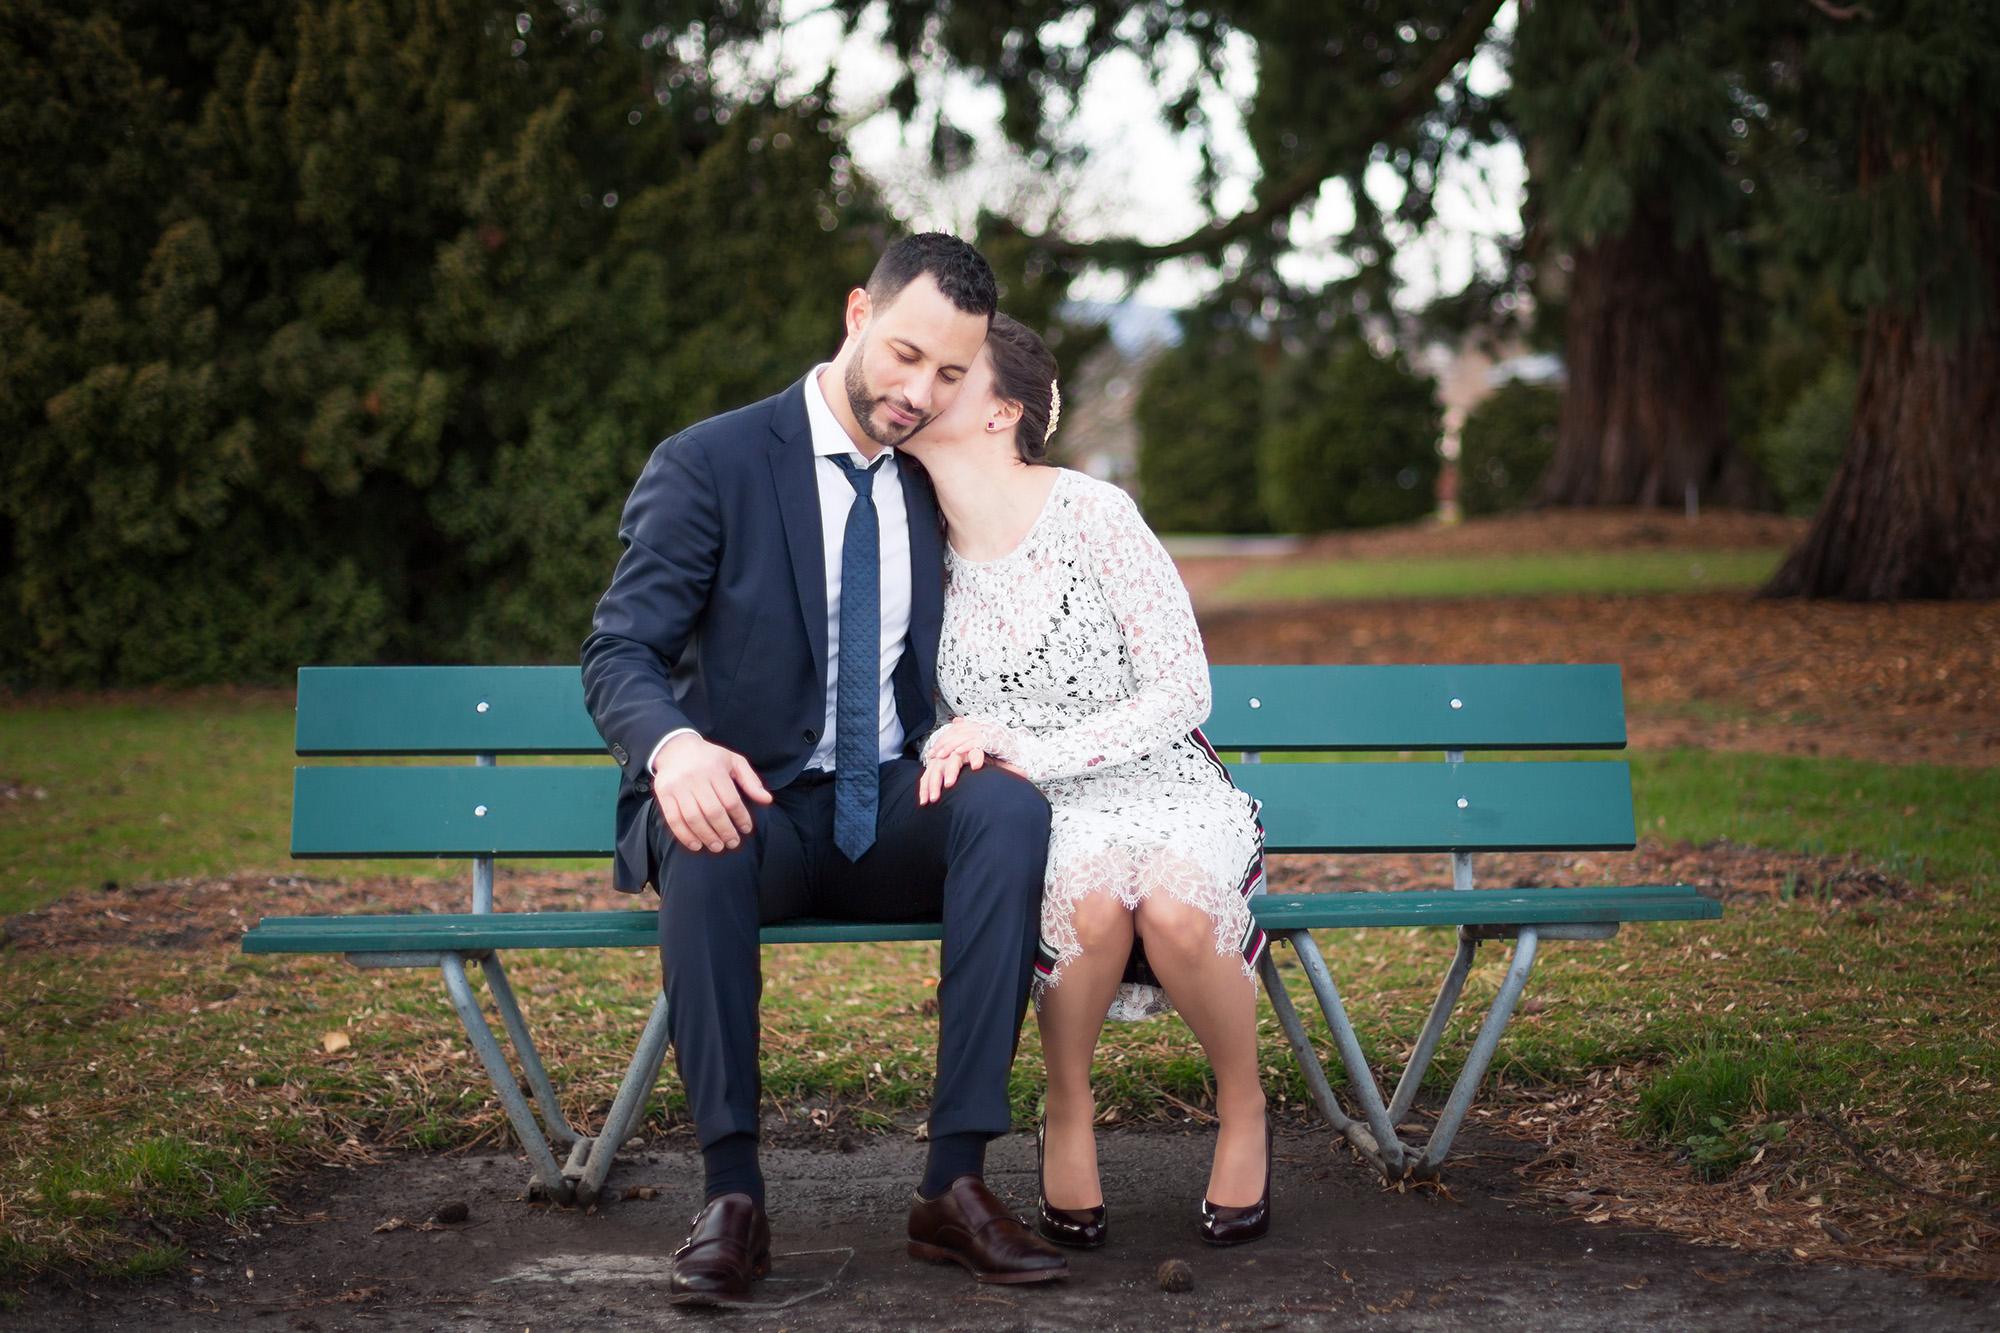 couple mariage banc wedding bride groom